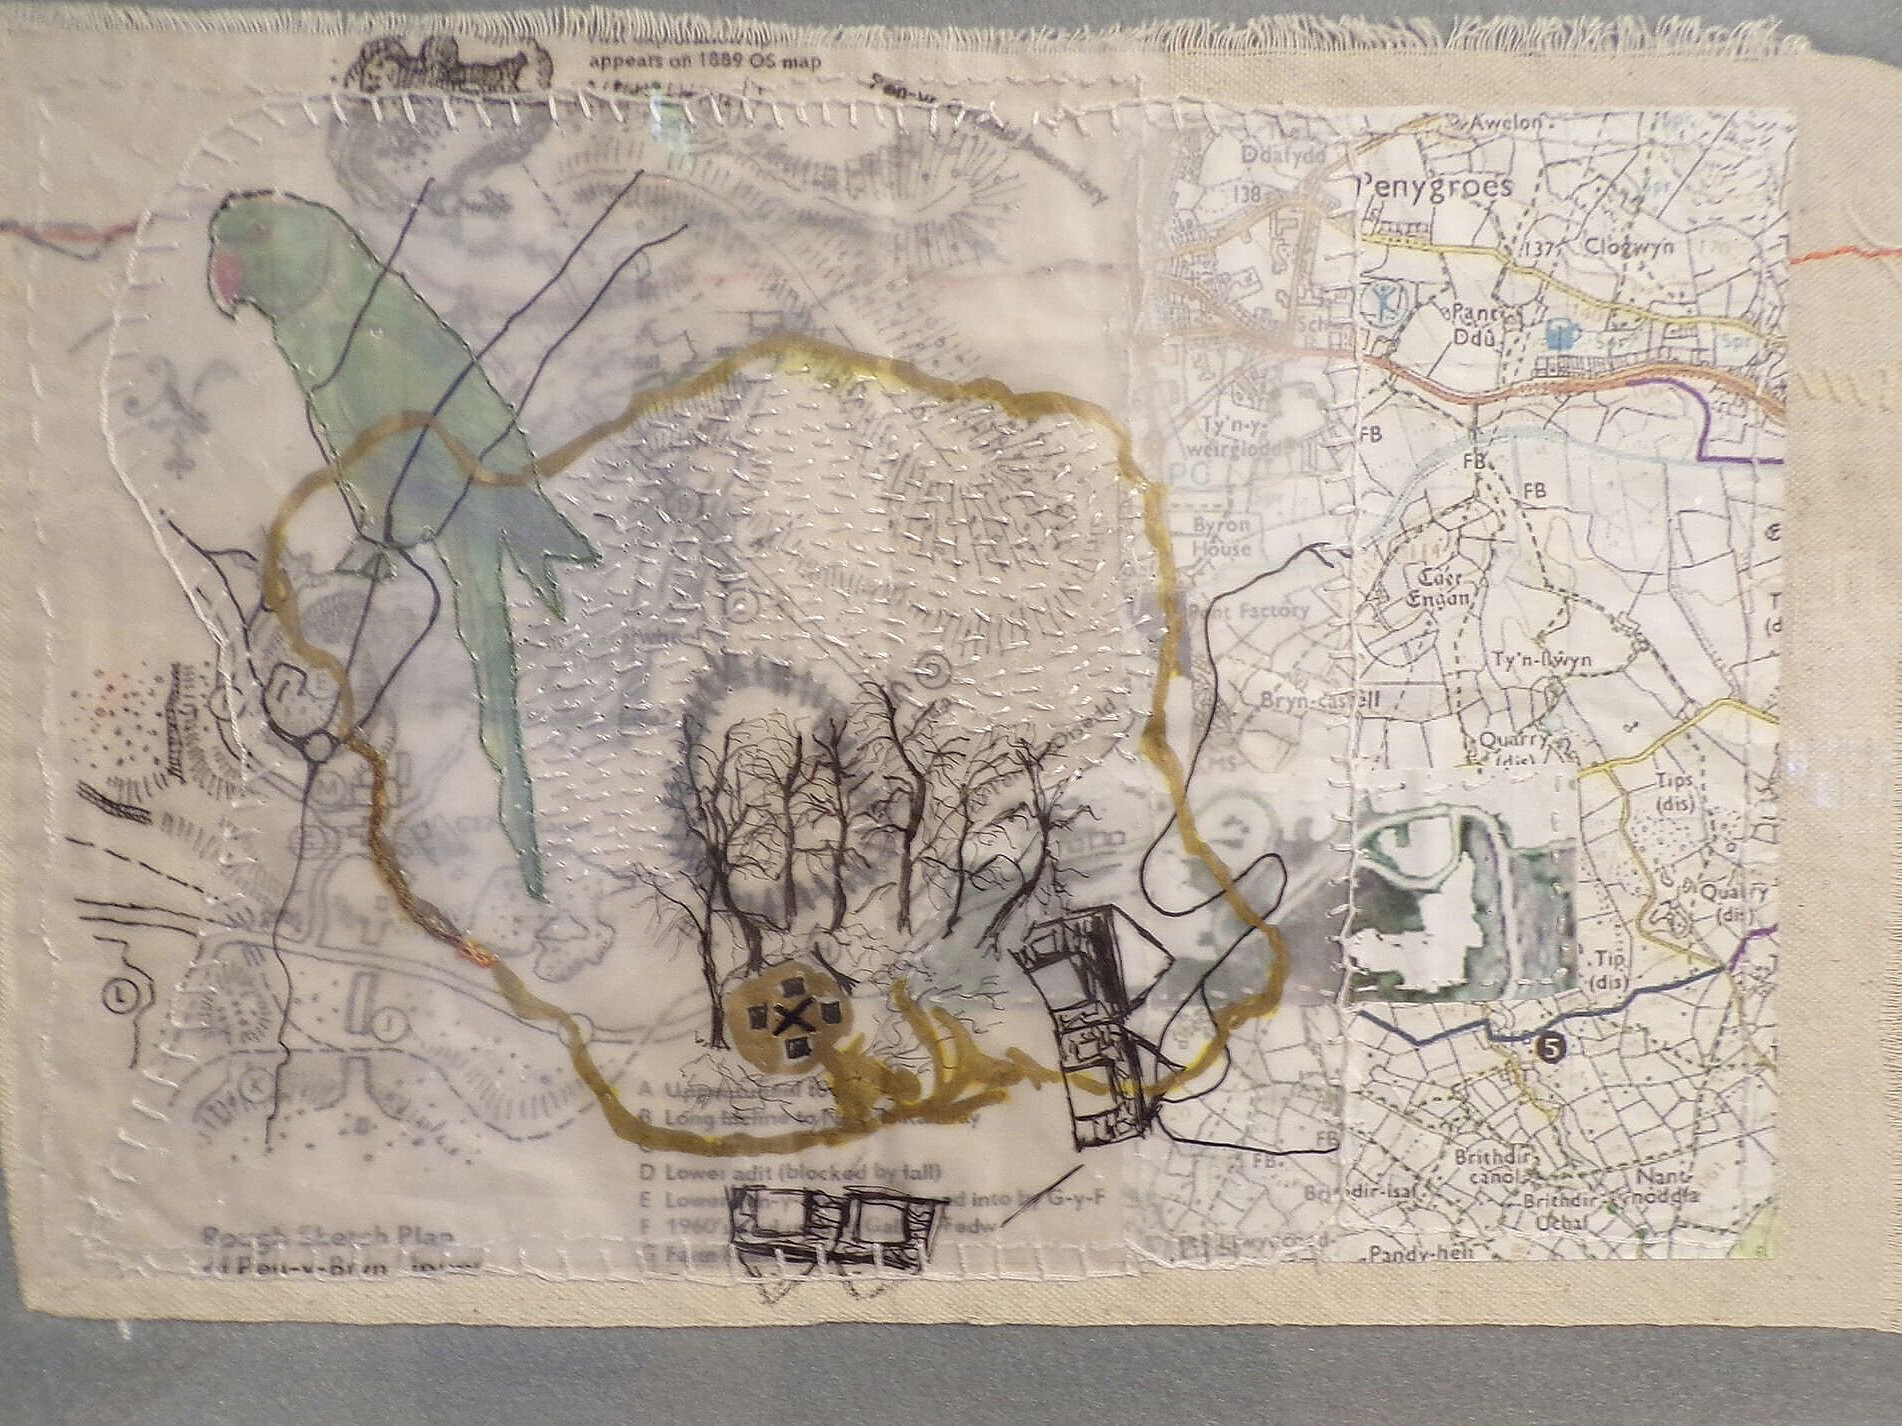 Lisa's map of Merched Chwarel's Tal y Sarn walk